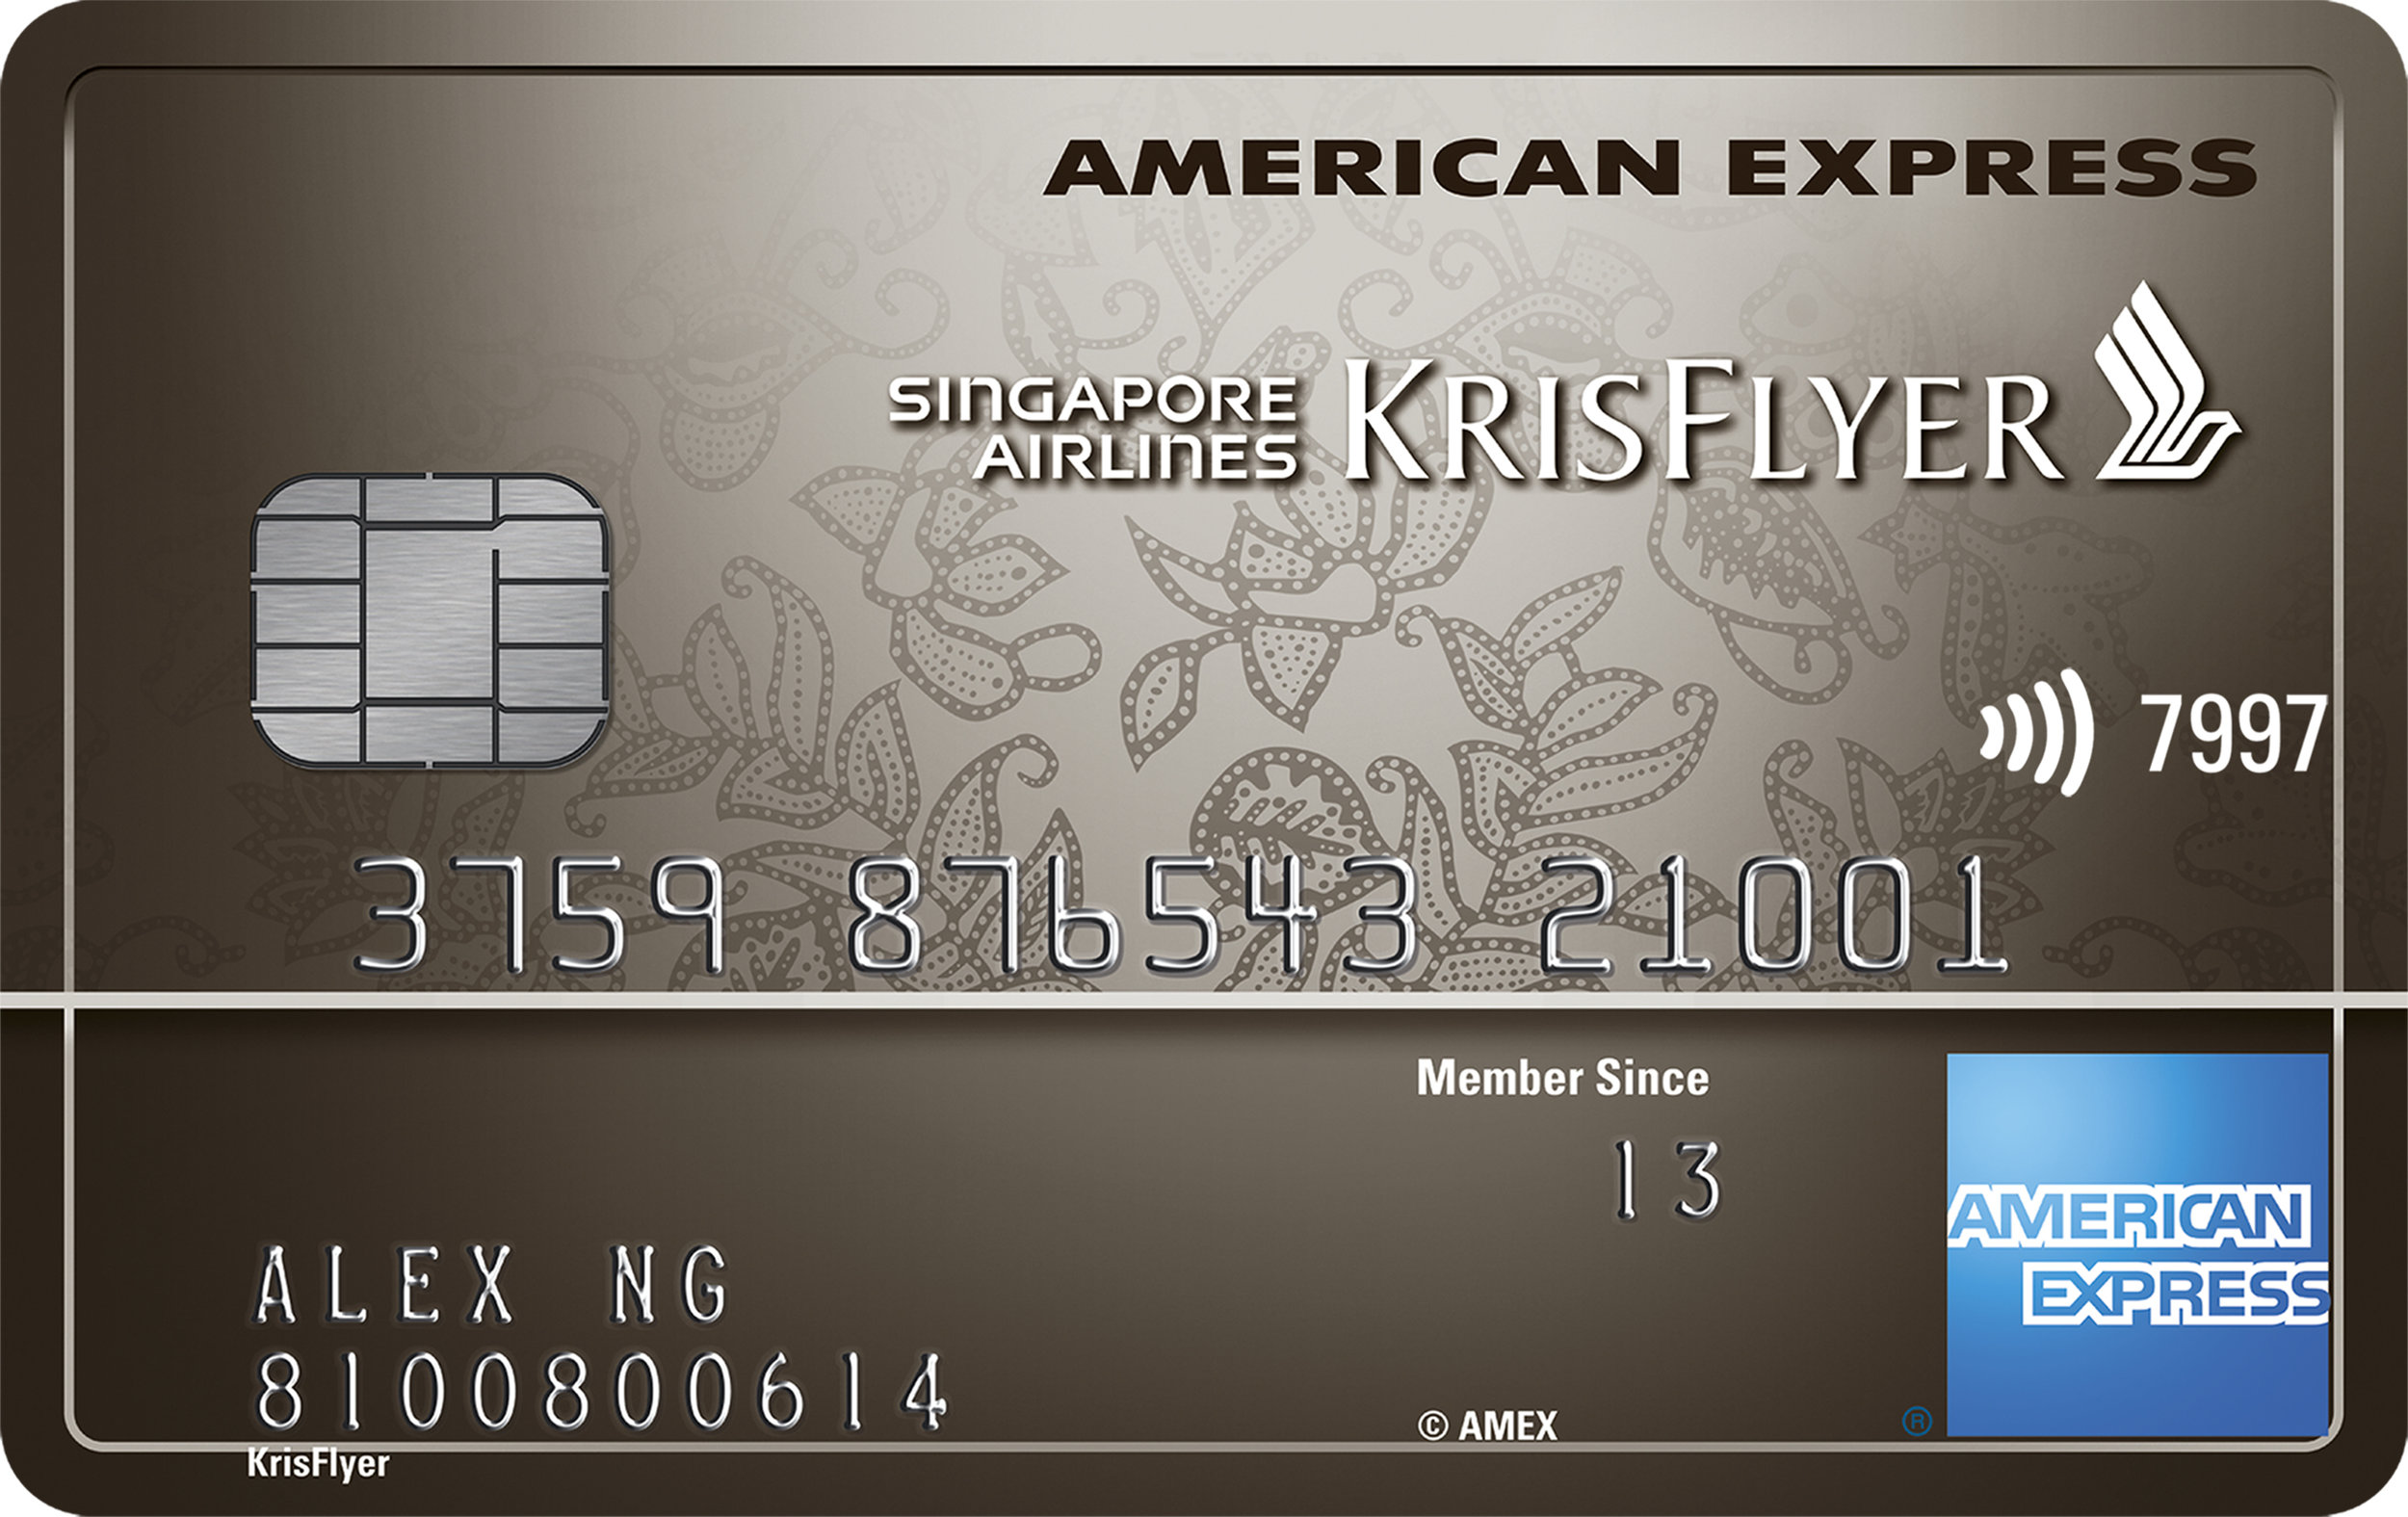 Photo Credit: American Express